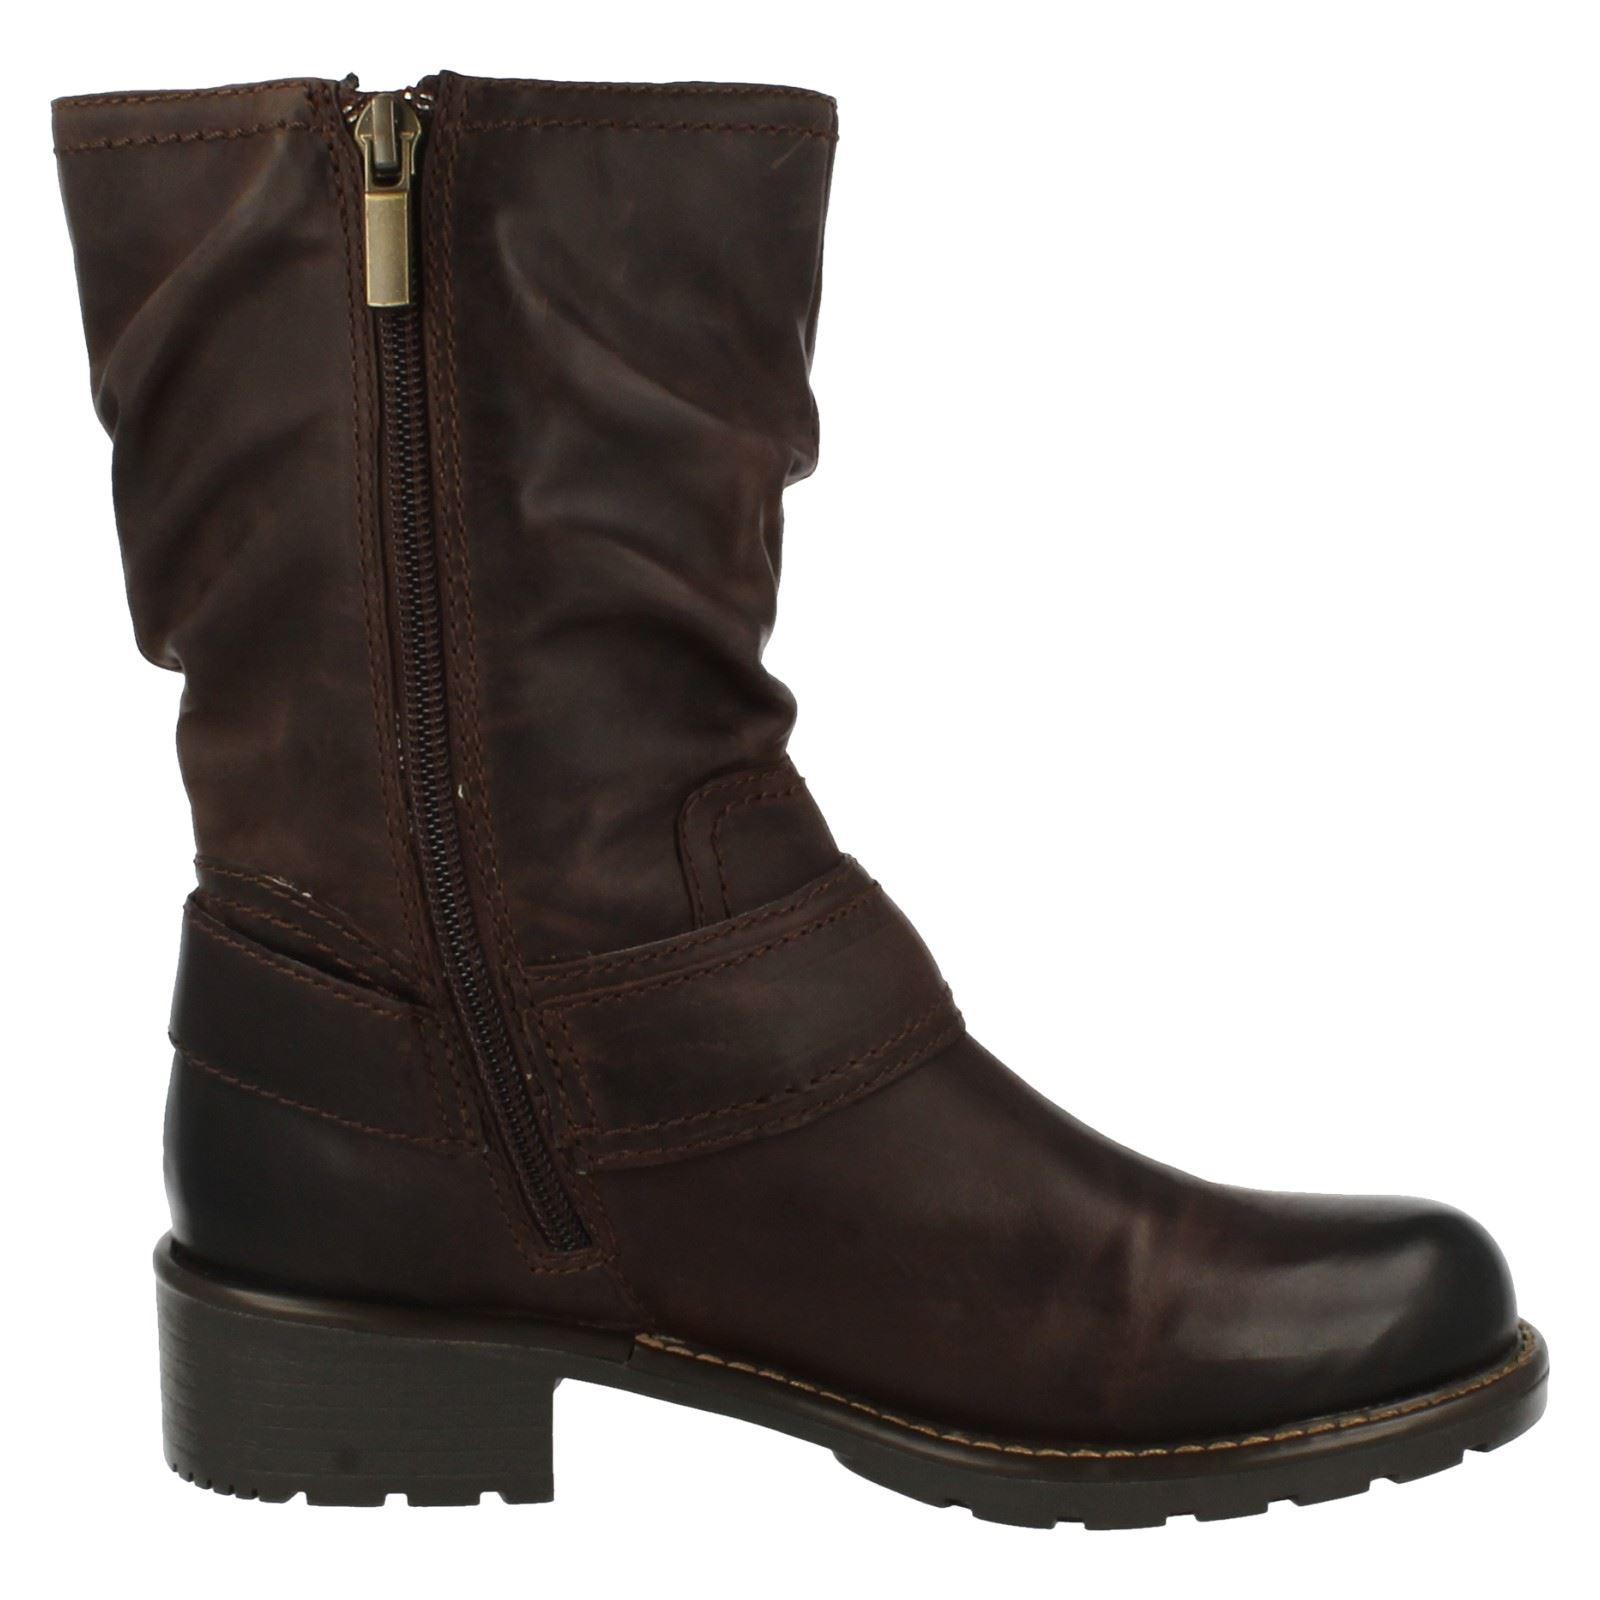 Ladies Clarks Mid Calf Boots Orinoco Jive